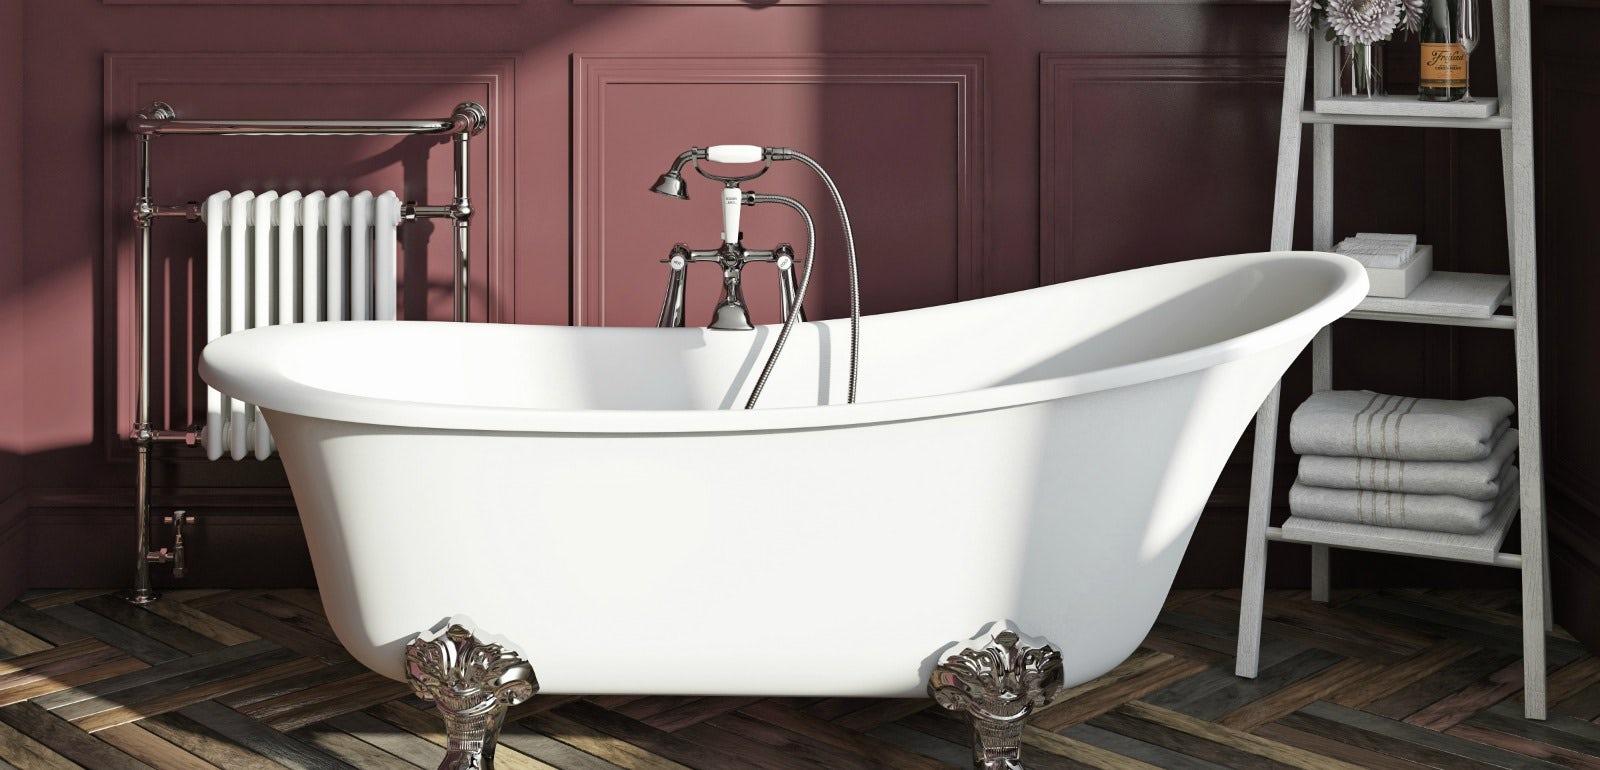 The world\'s best hotel bathrooms: Get the look   VictoriaPlum.com